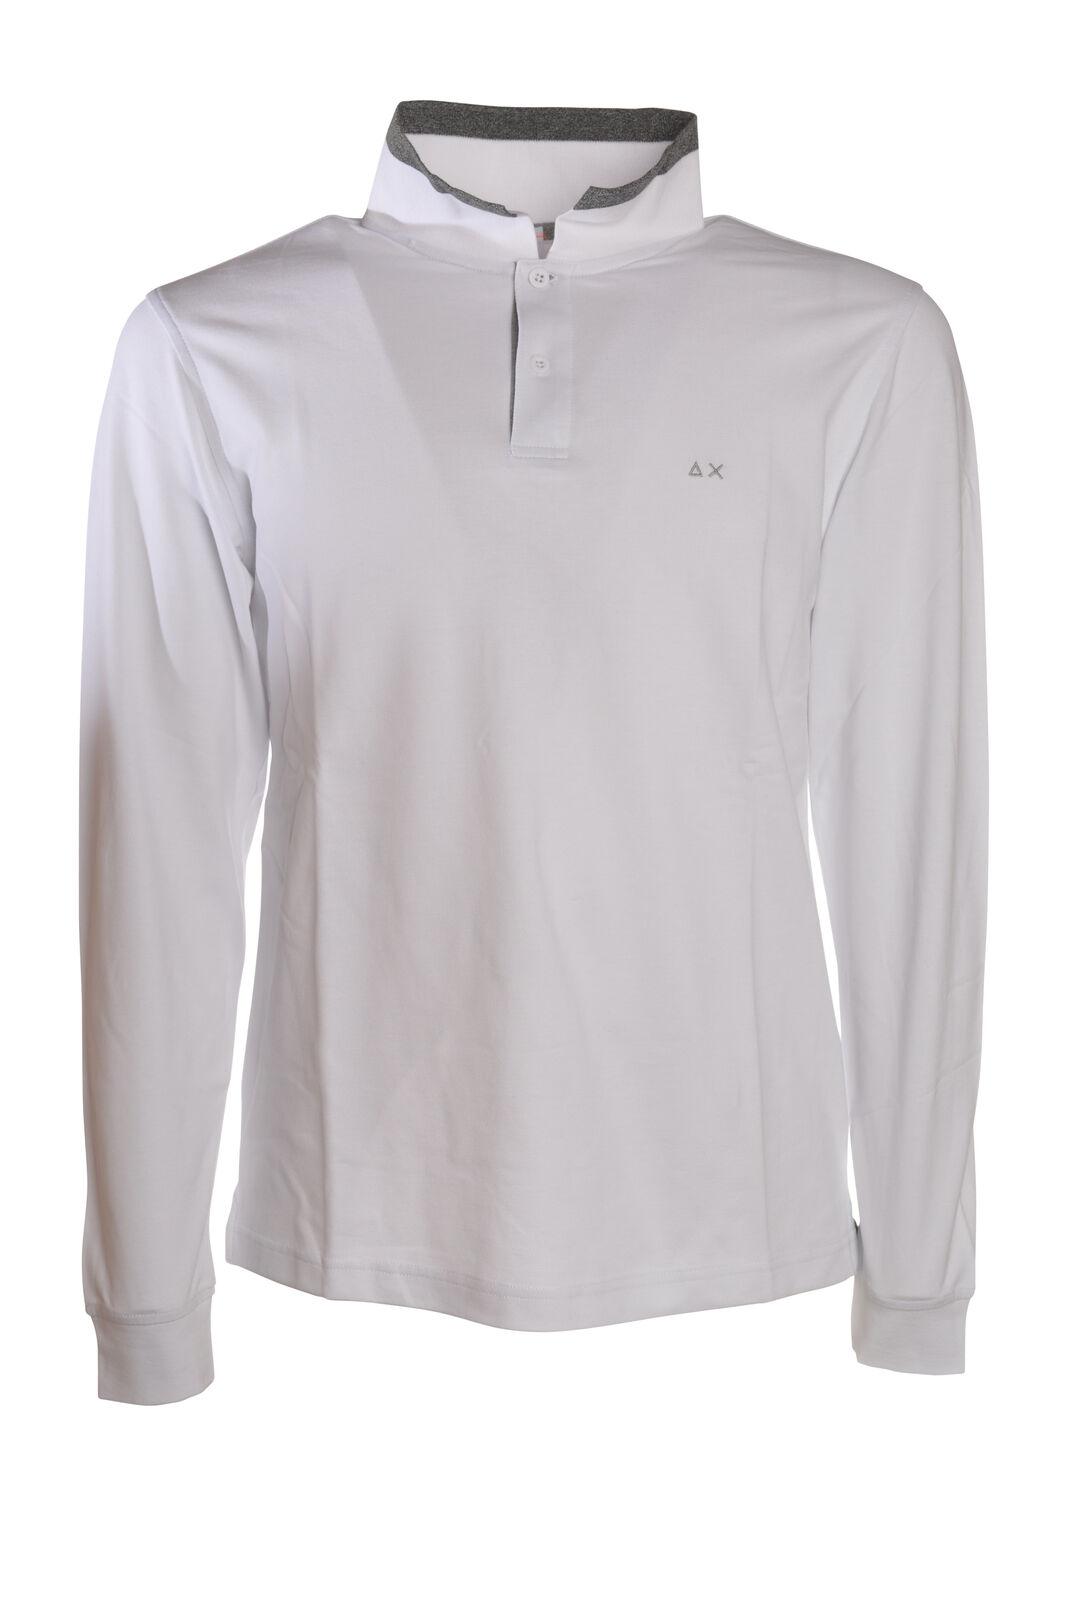 Sun 68 - Topwear Polo - Mann - white - 5651507C195225